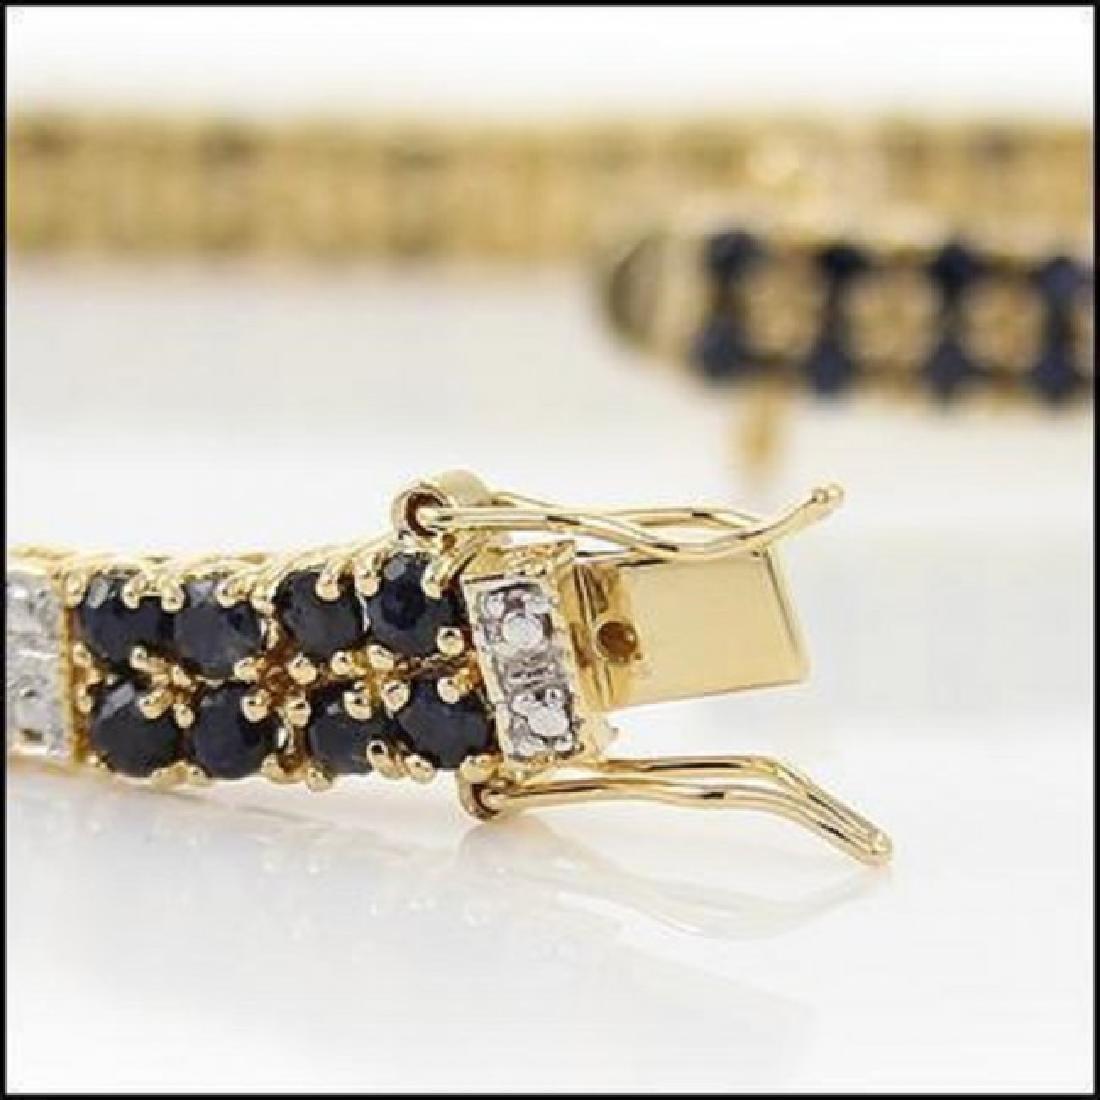 Jewelry Sale 17.69 CT Sapphire & Diamond Bracelet - 3